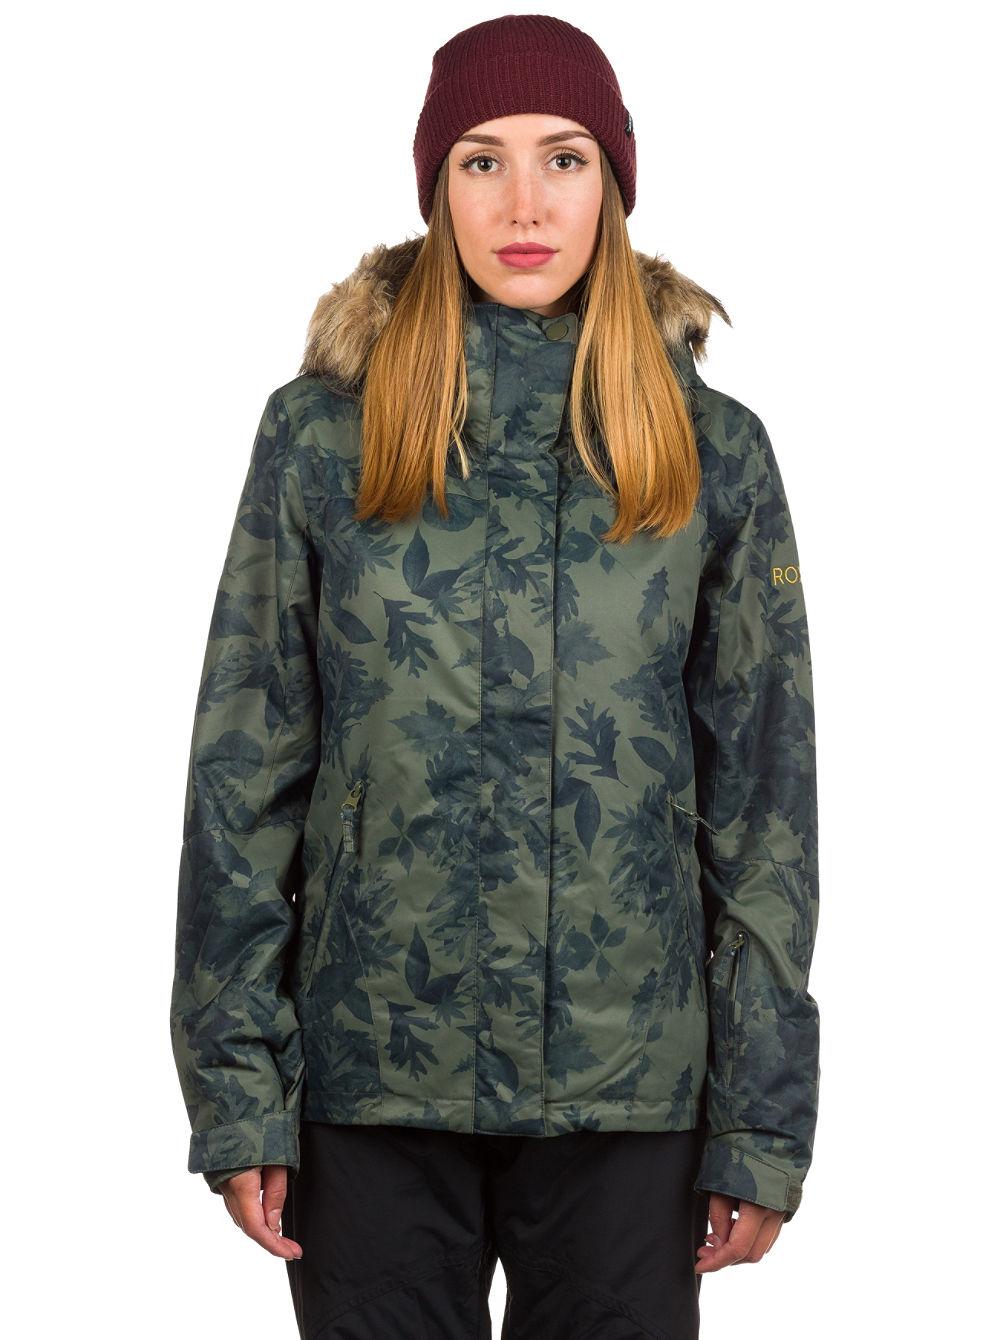 d5fe111d771a Buy Roxy Jet Ski Jacket online at blue-tomato.com